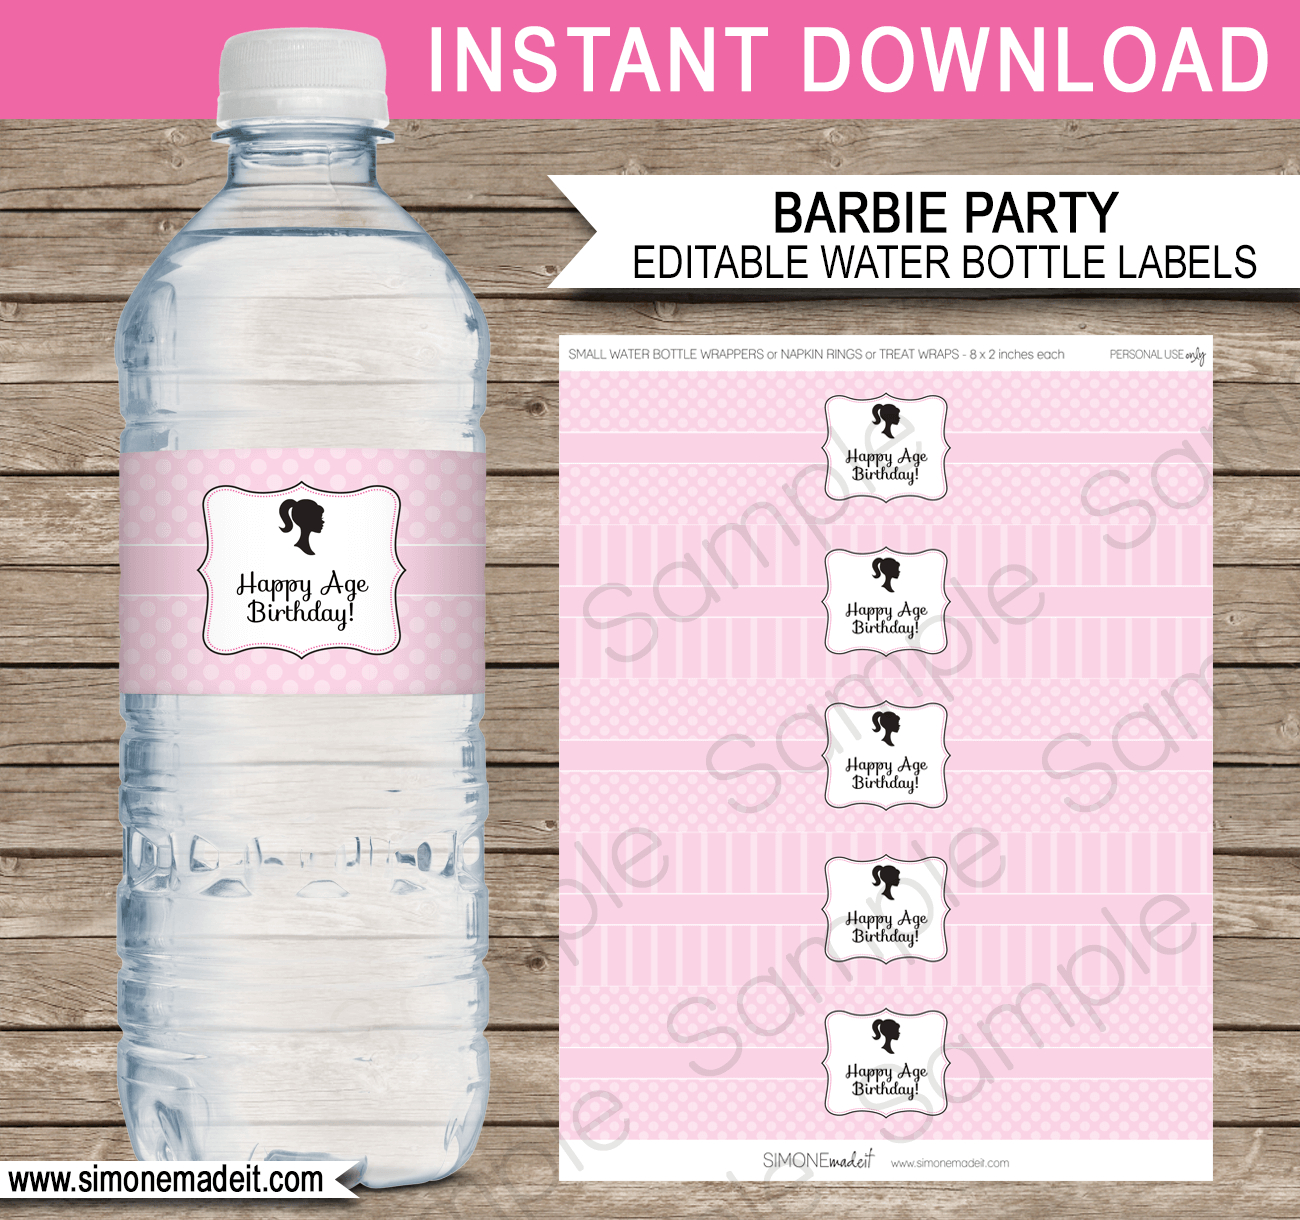 Barbie Party Water Bottle Labels | Editable Template - Free Printable Paris Water Bottle Labels